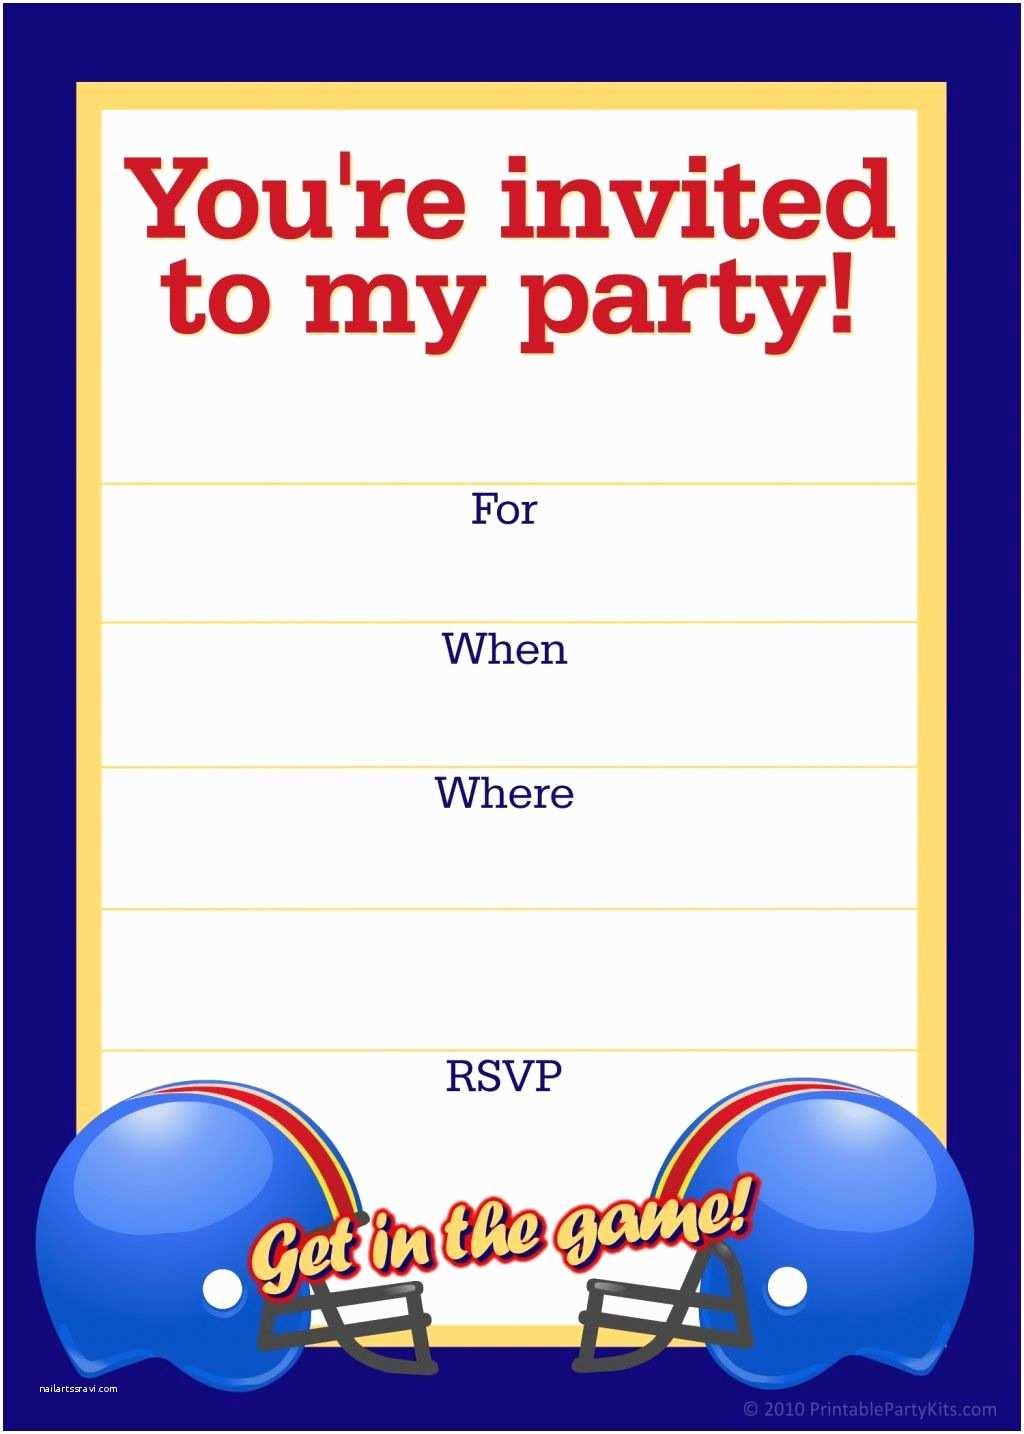 Football Party Invitations Templates Free Free Printable Sports Birthday Party Invitations Templates